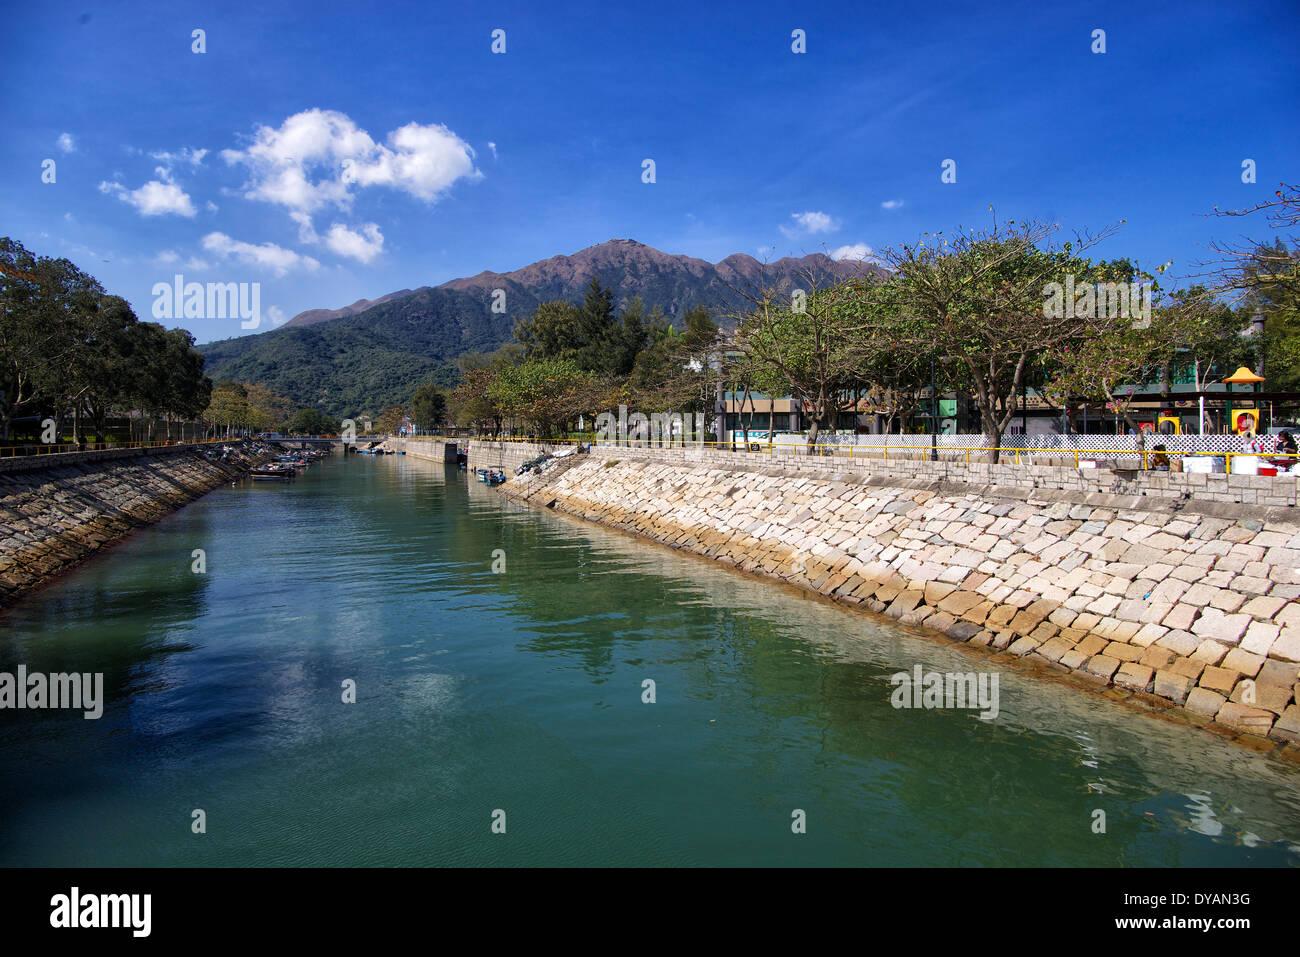 Hong Kong Lantau Island Mui Wo river - Stock Image